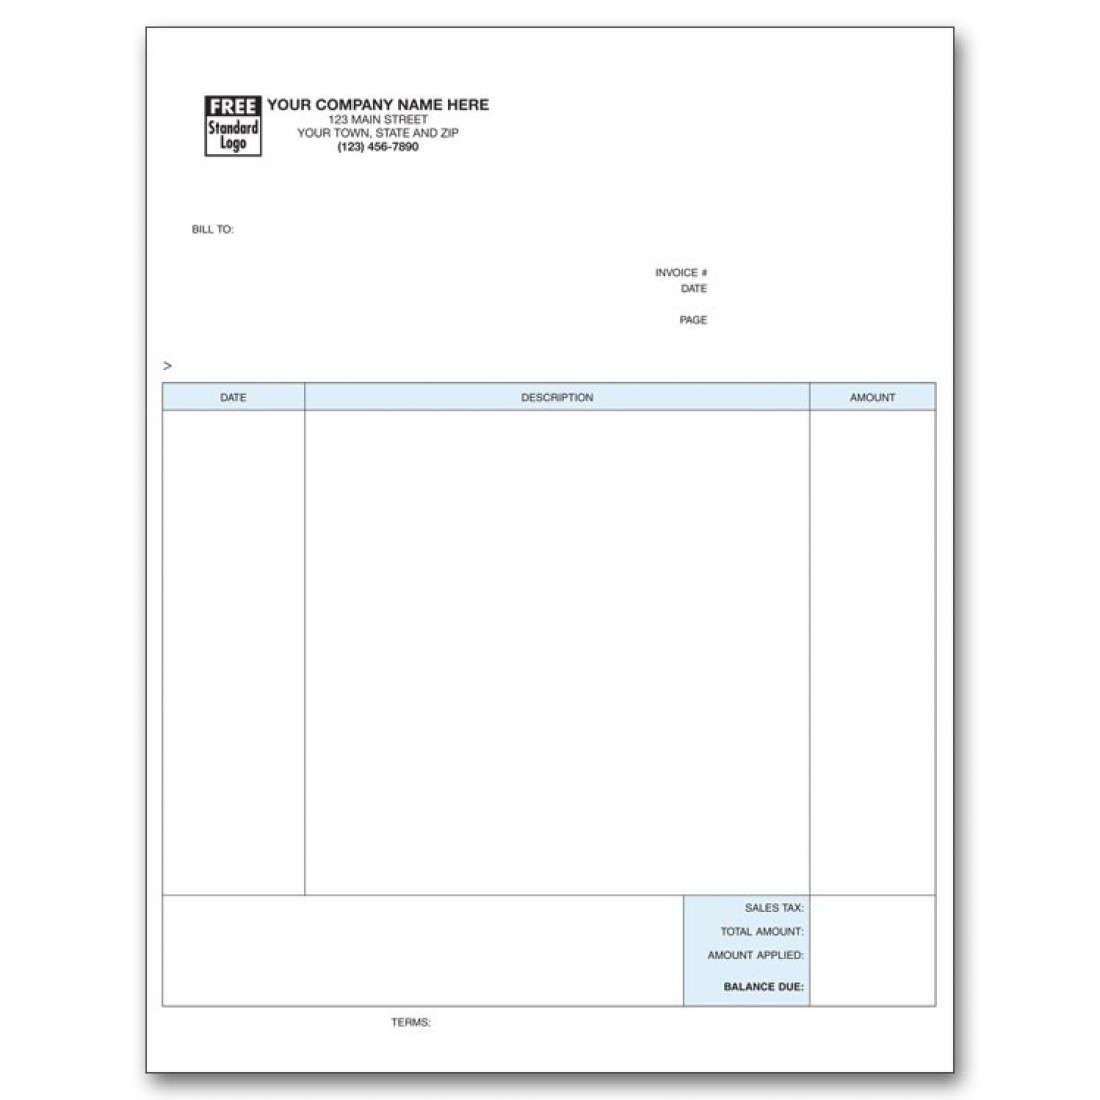 Laser Professional Invoice